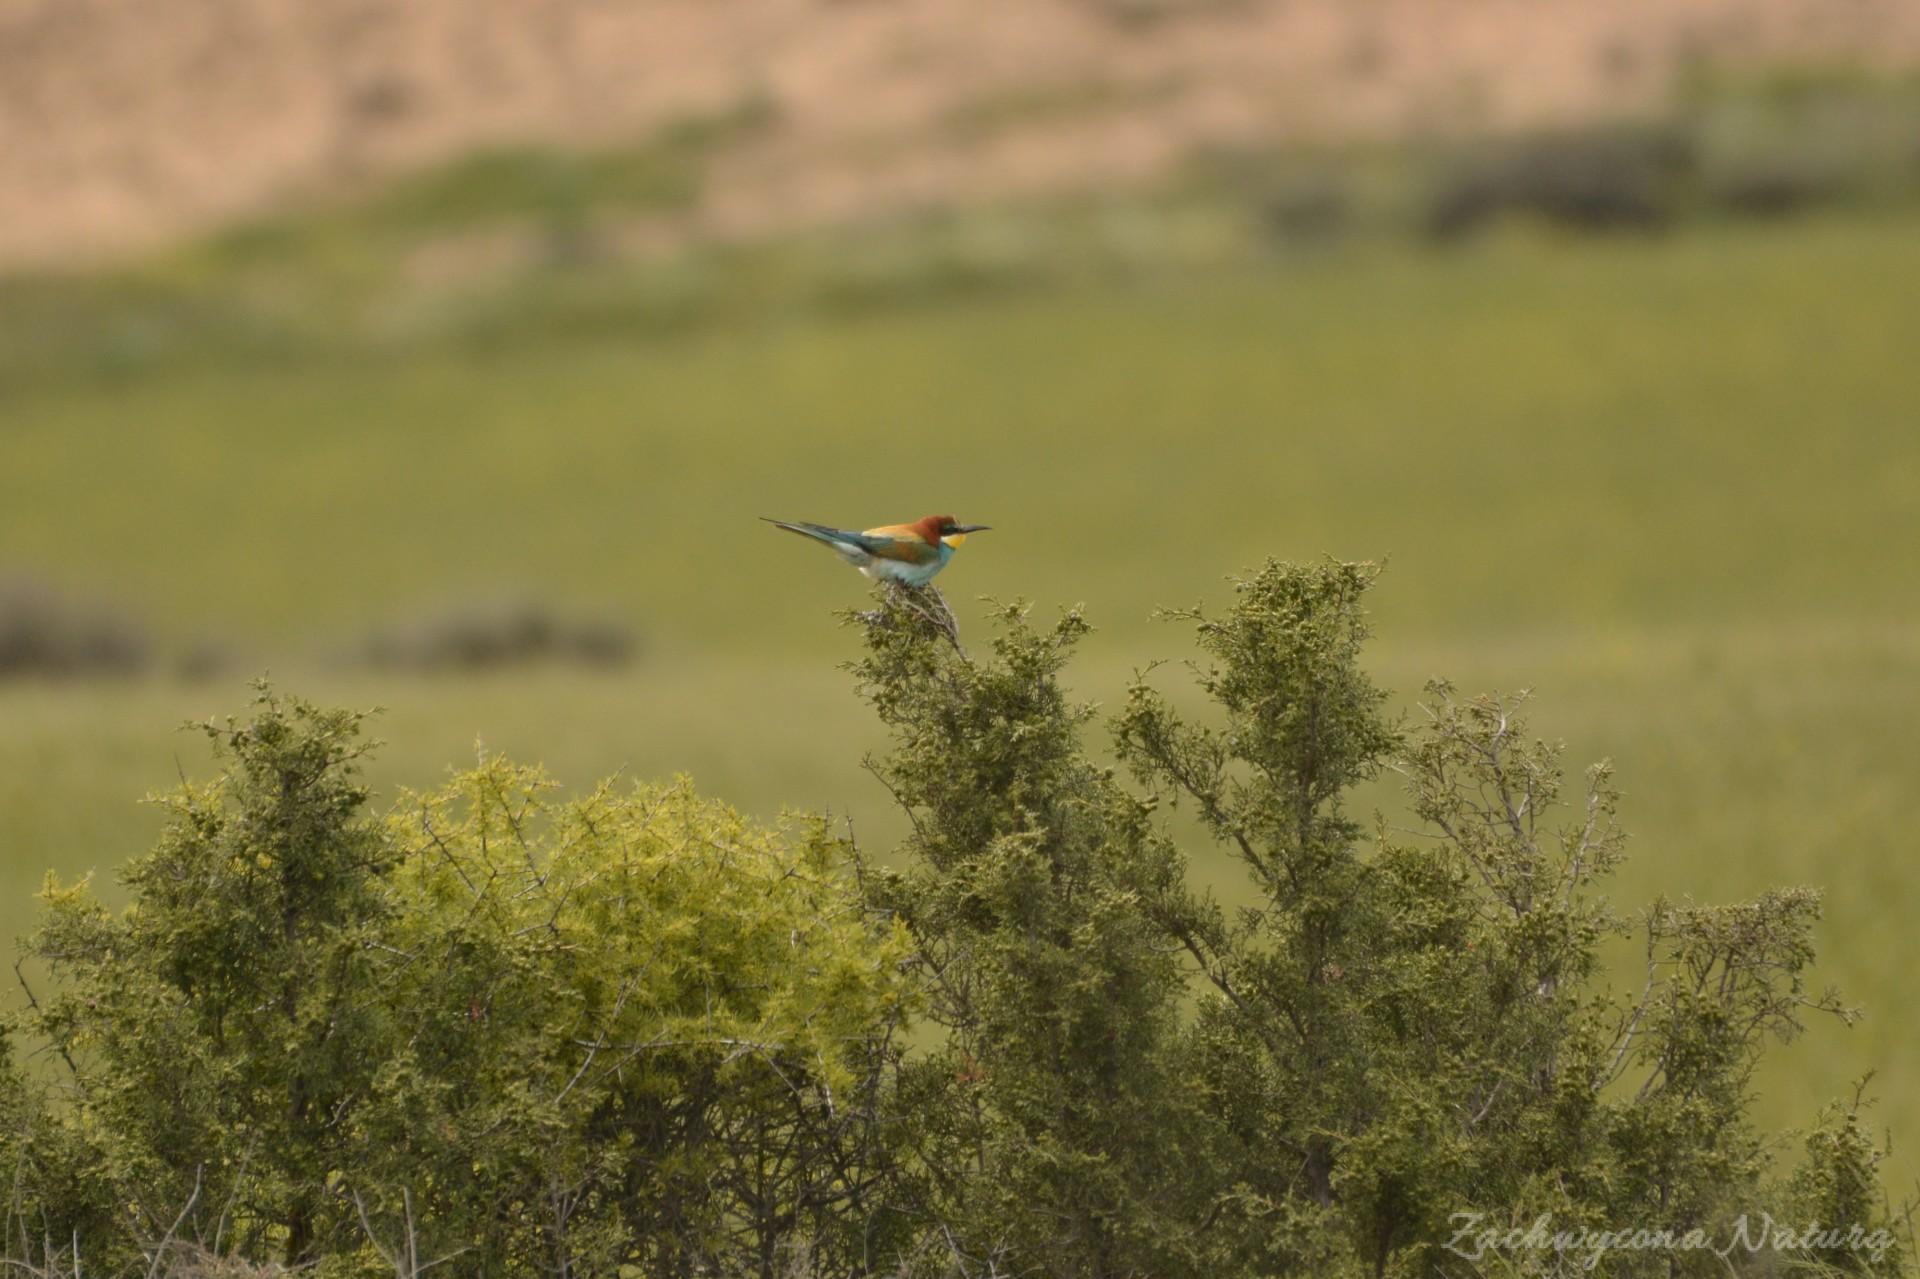 zolna-kolorowa-jak-papuga-merops-apiaster-bee-eater-3